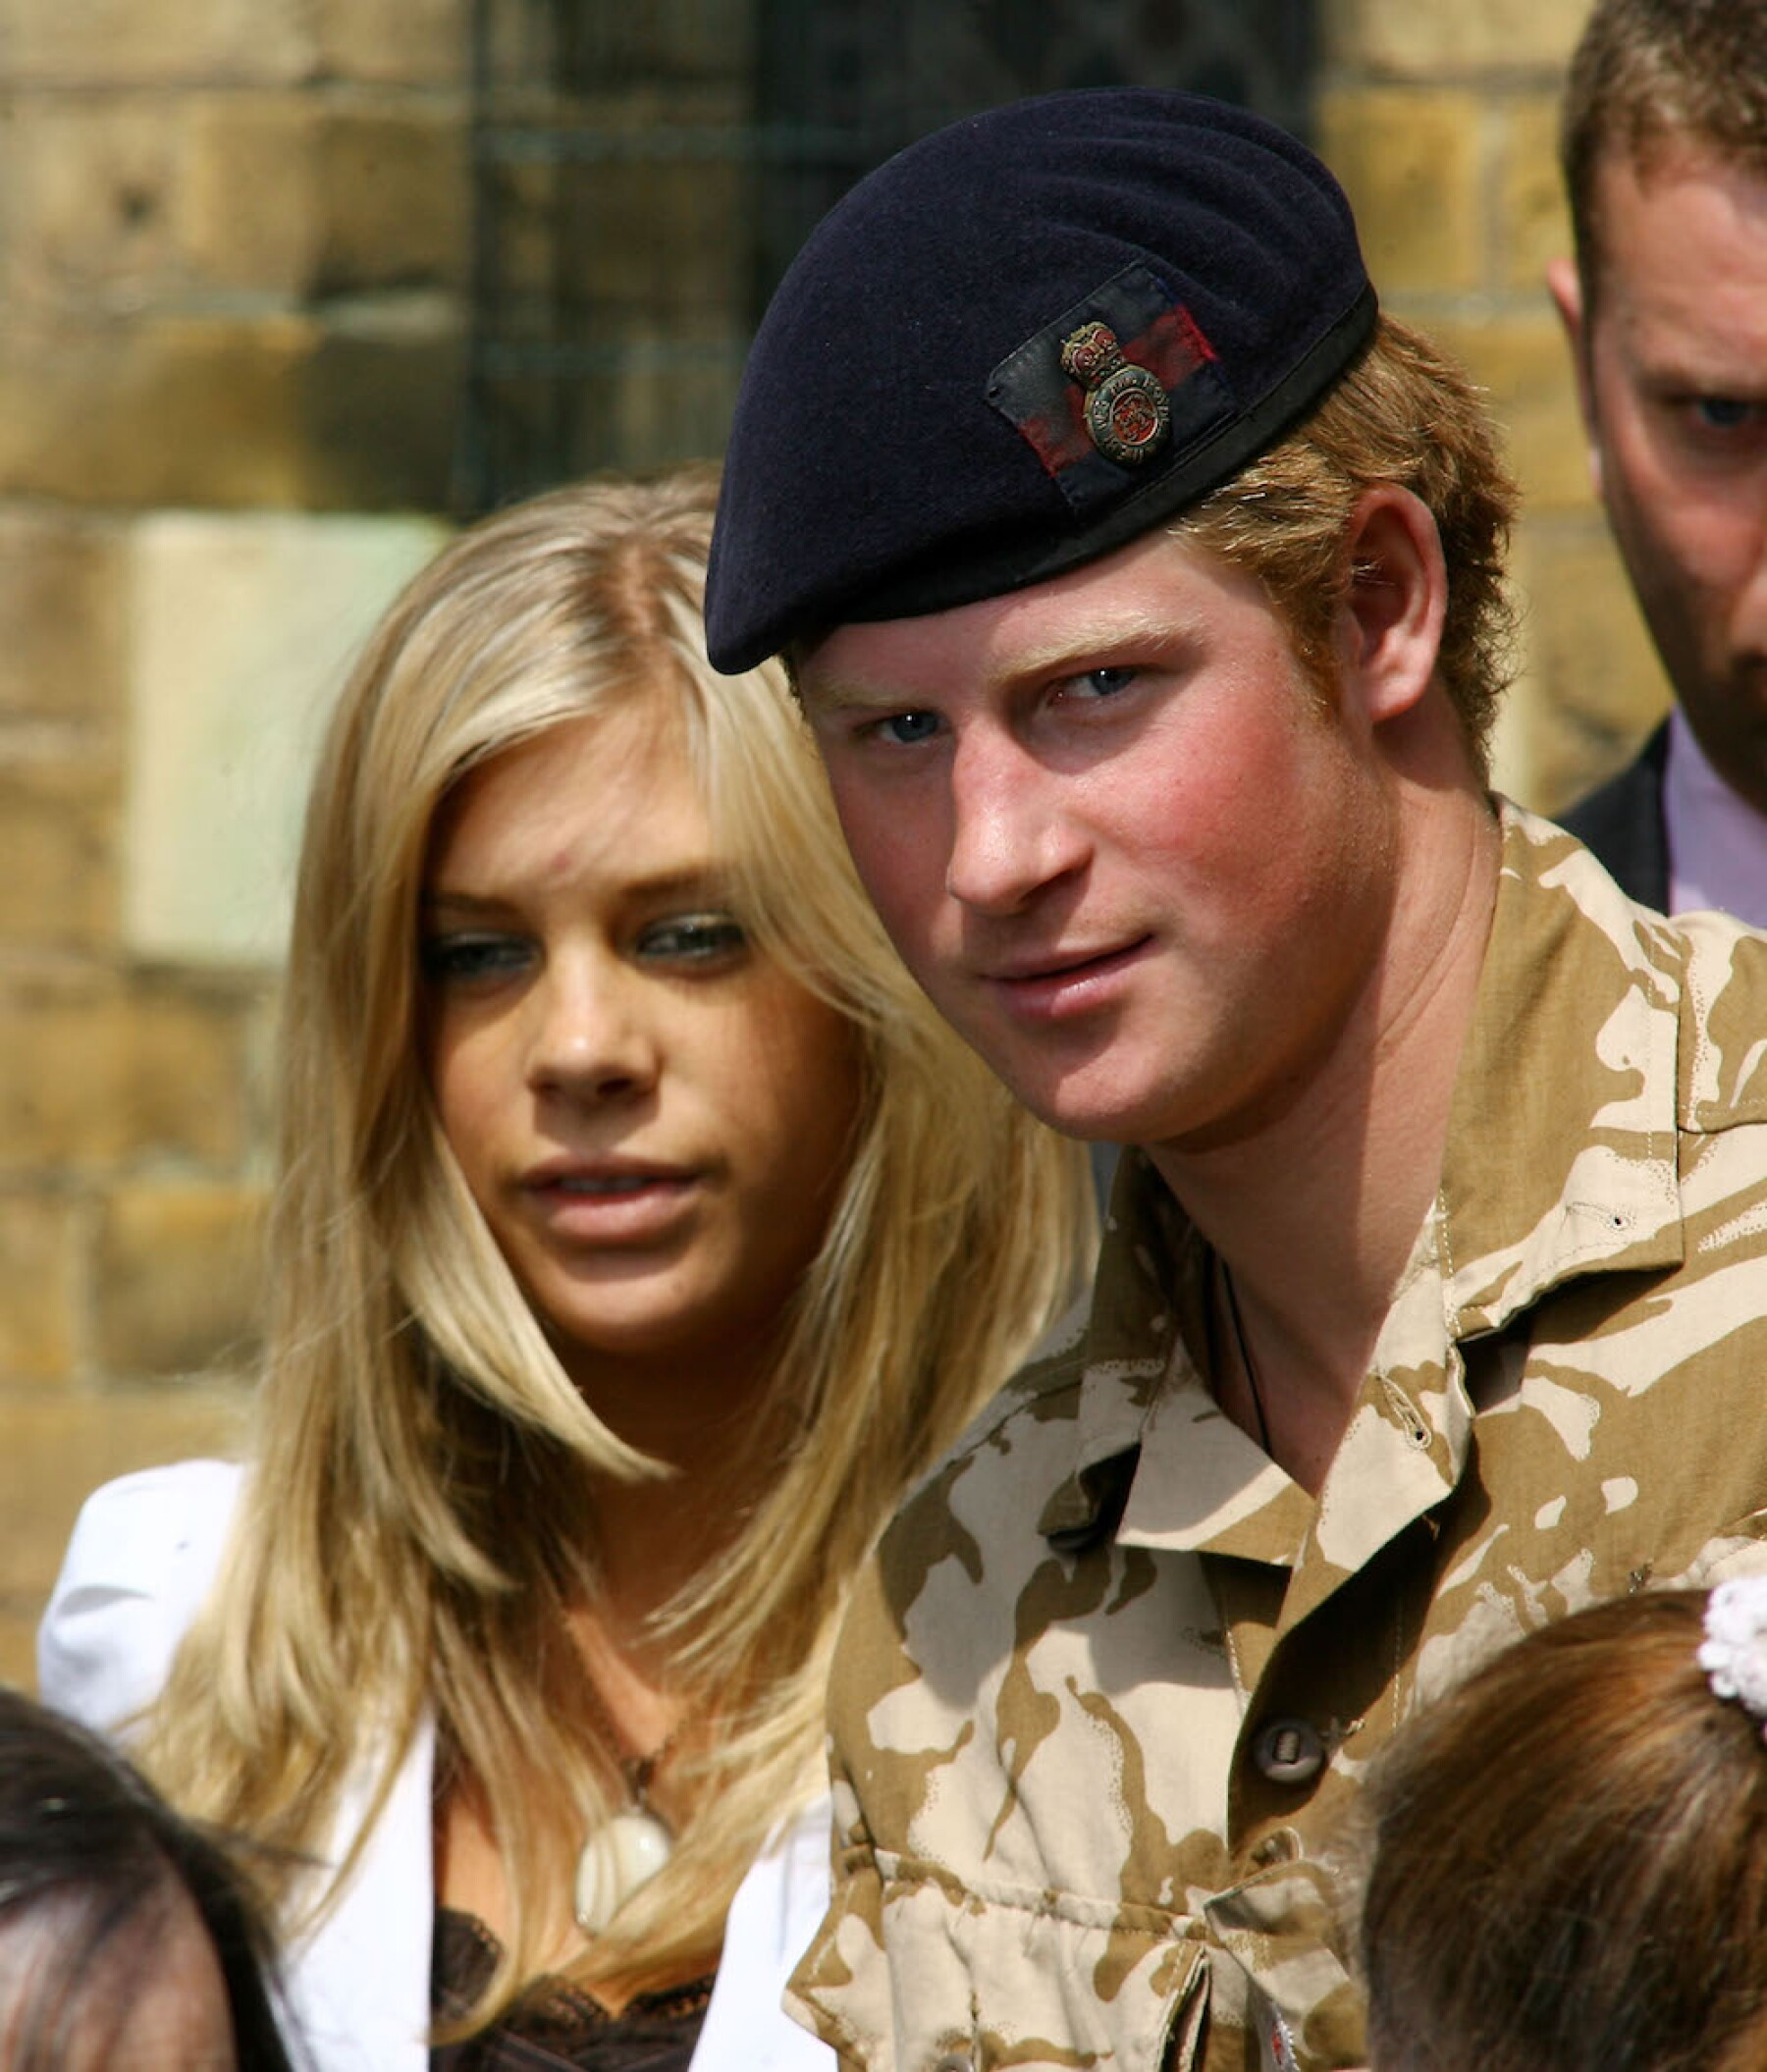 Prince Harry Afghanistan Campaign Medal - Presentation